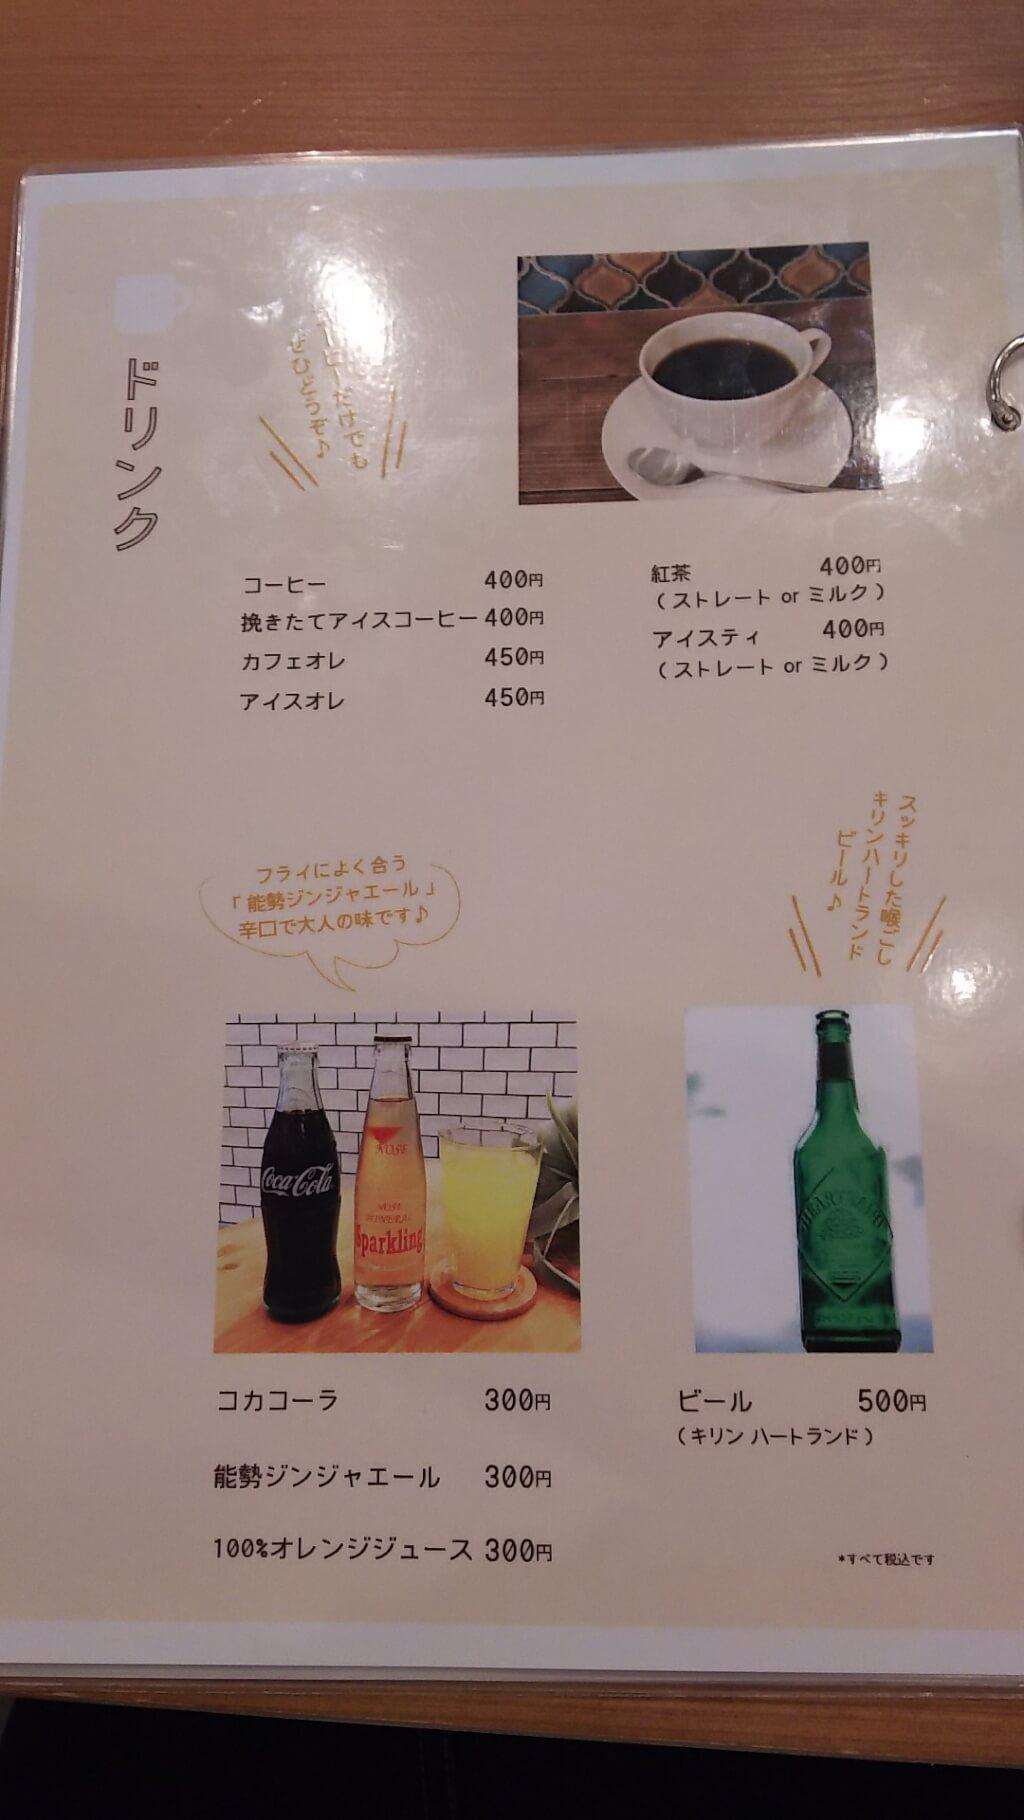 Osaka コロミツ堂 ドリンクメニュー